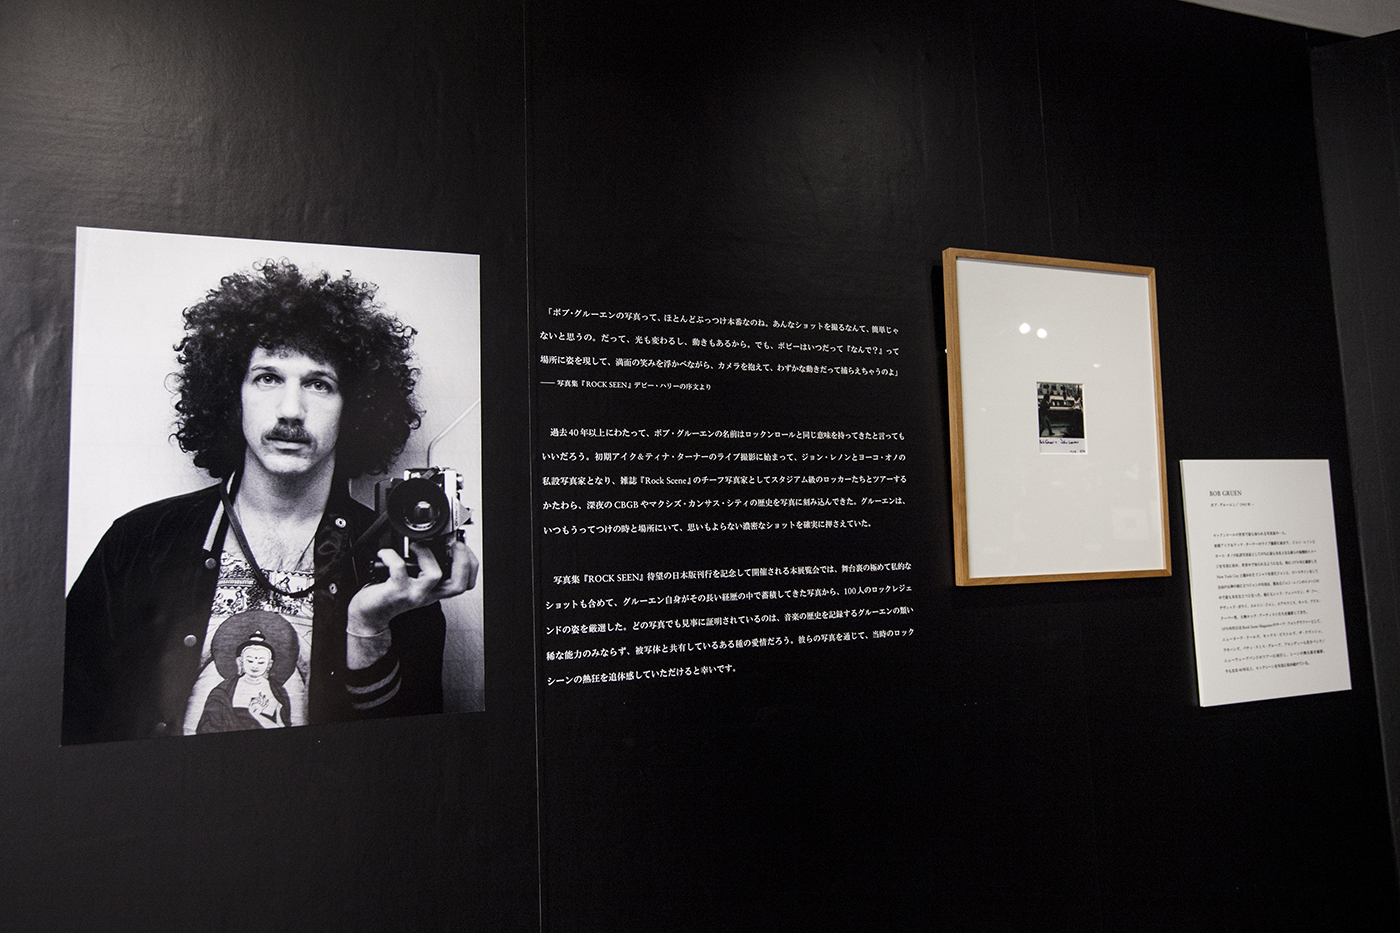 m-0005 【レポート】ロックの歴史が凝縮。フジロックファンも必見のボブ・グルーエン写真展